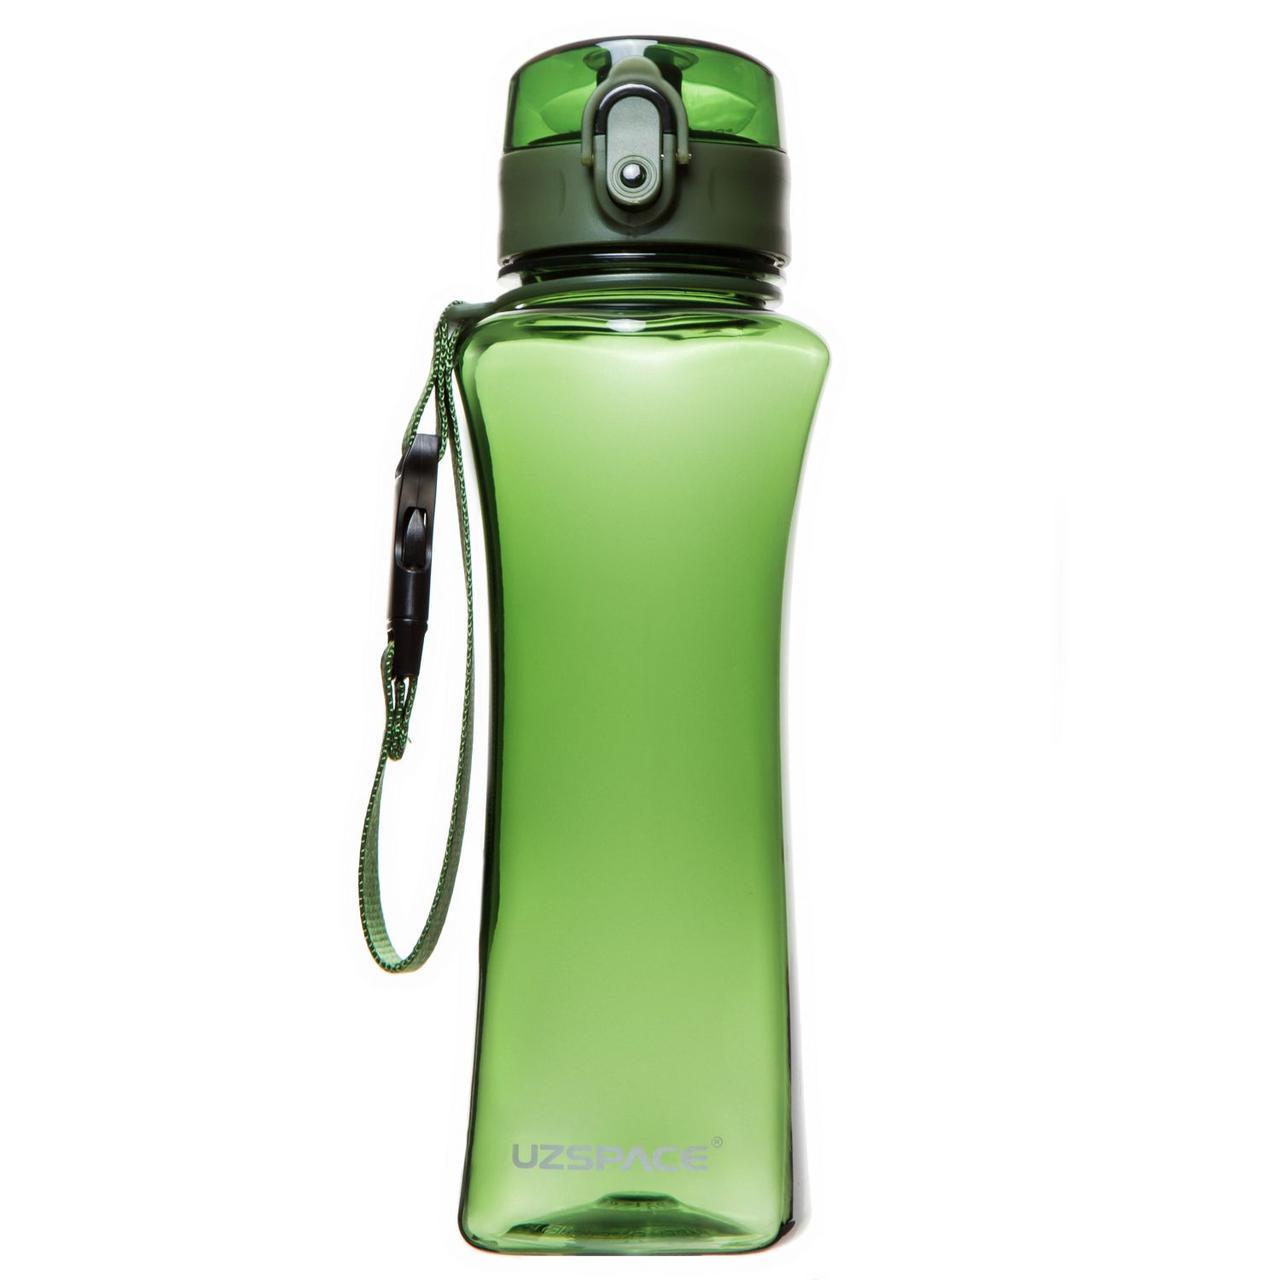 Бутылка для воды UZSPACE 6006 500 мл, зелёная